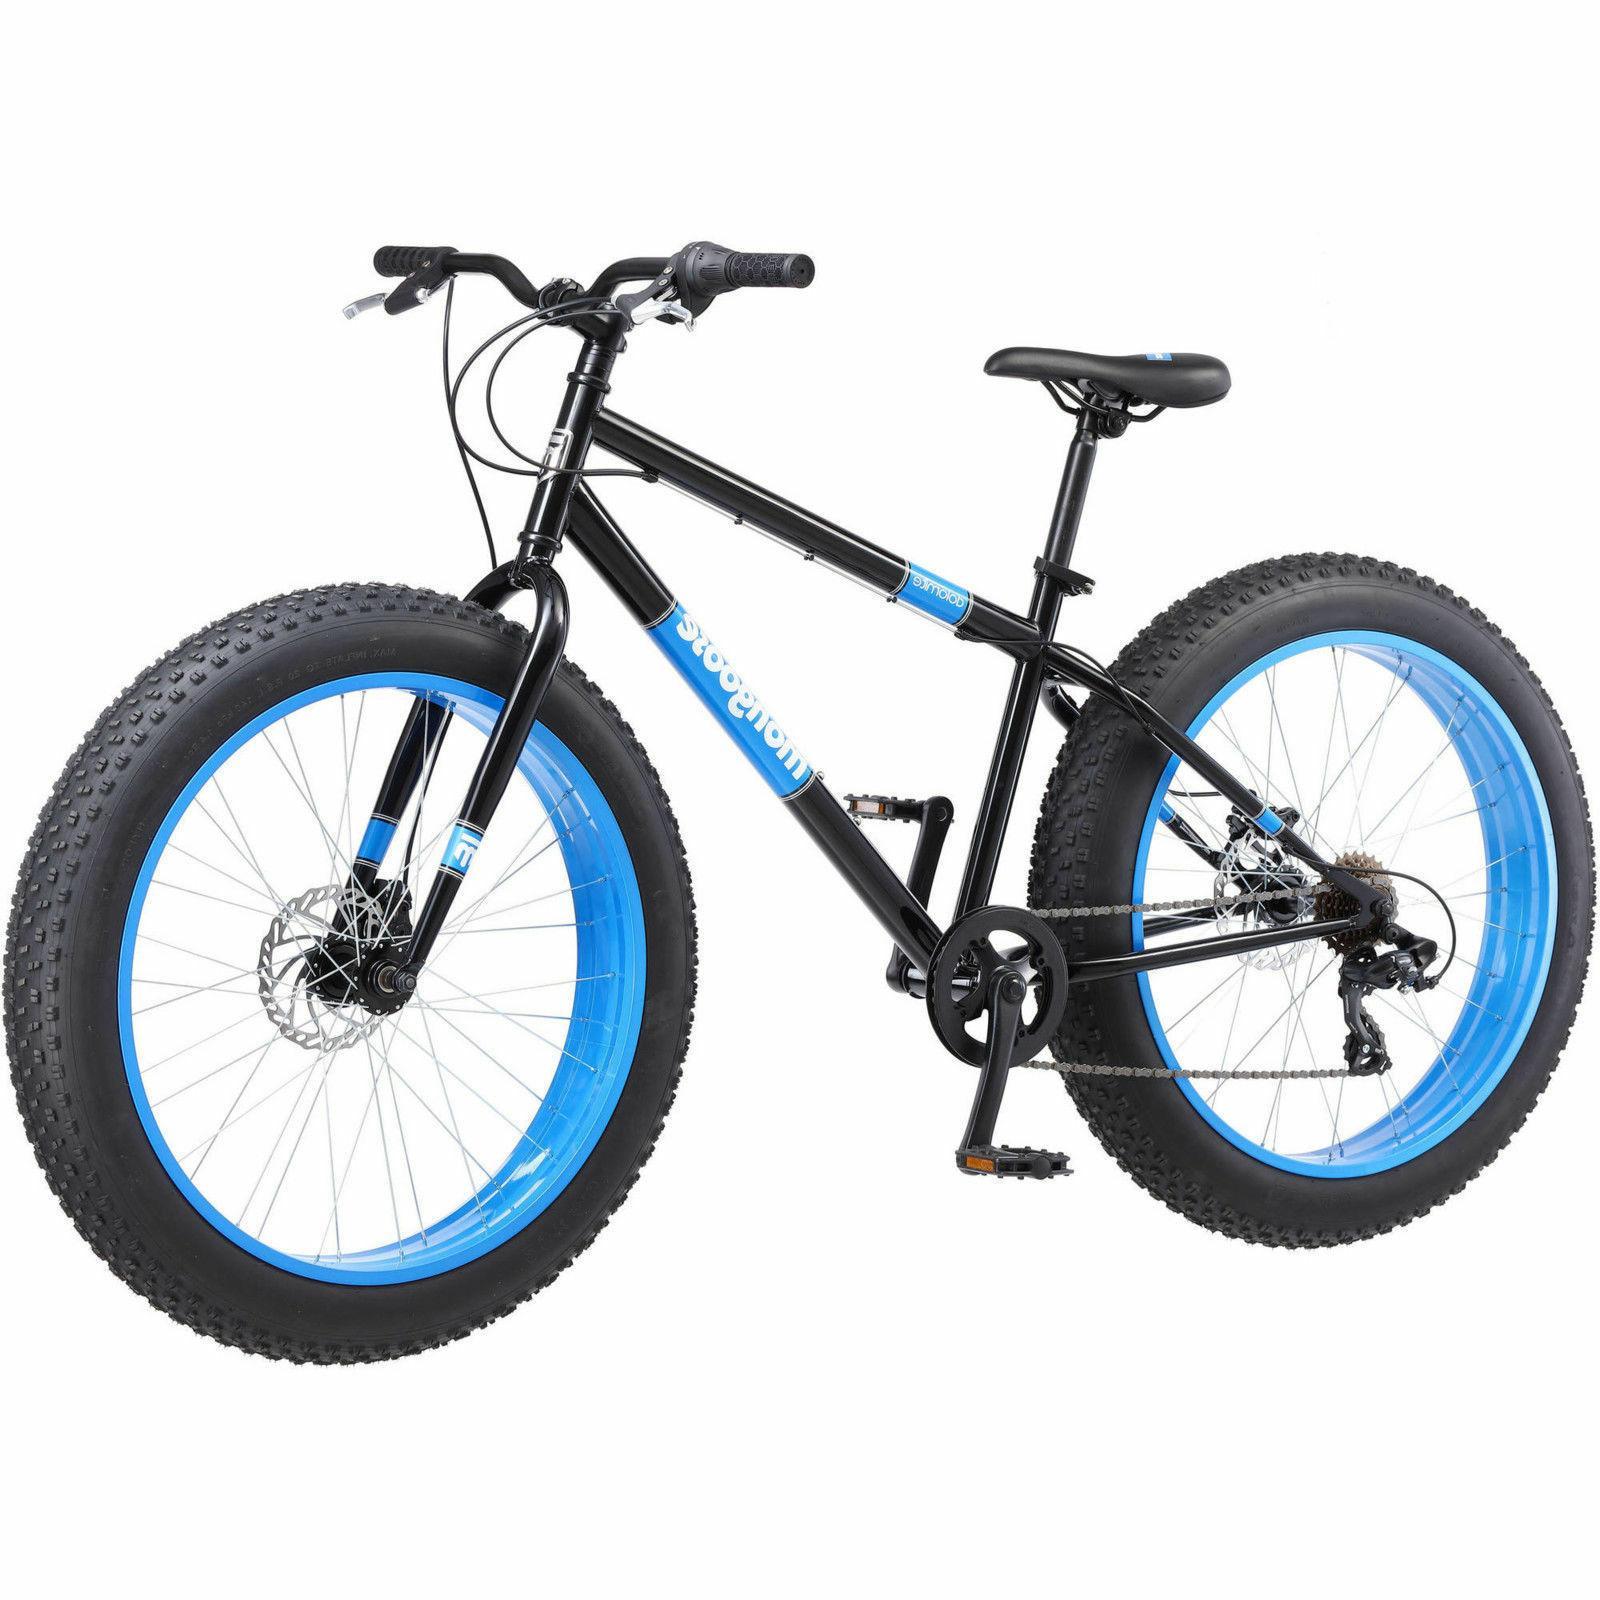 "26"" Mongoose Dolomite Fat Tire Bike"